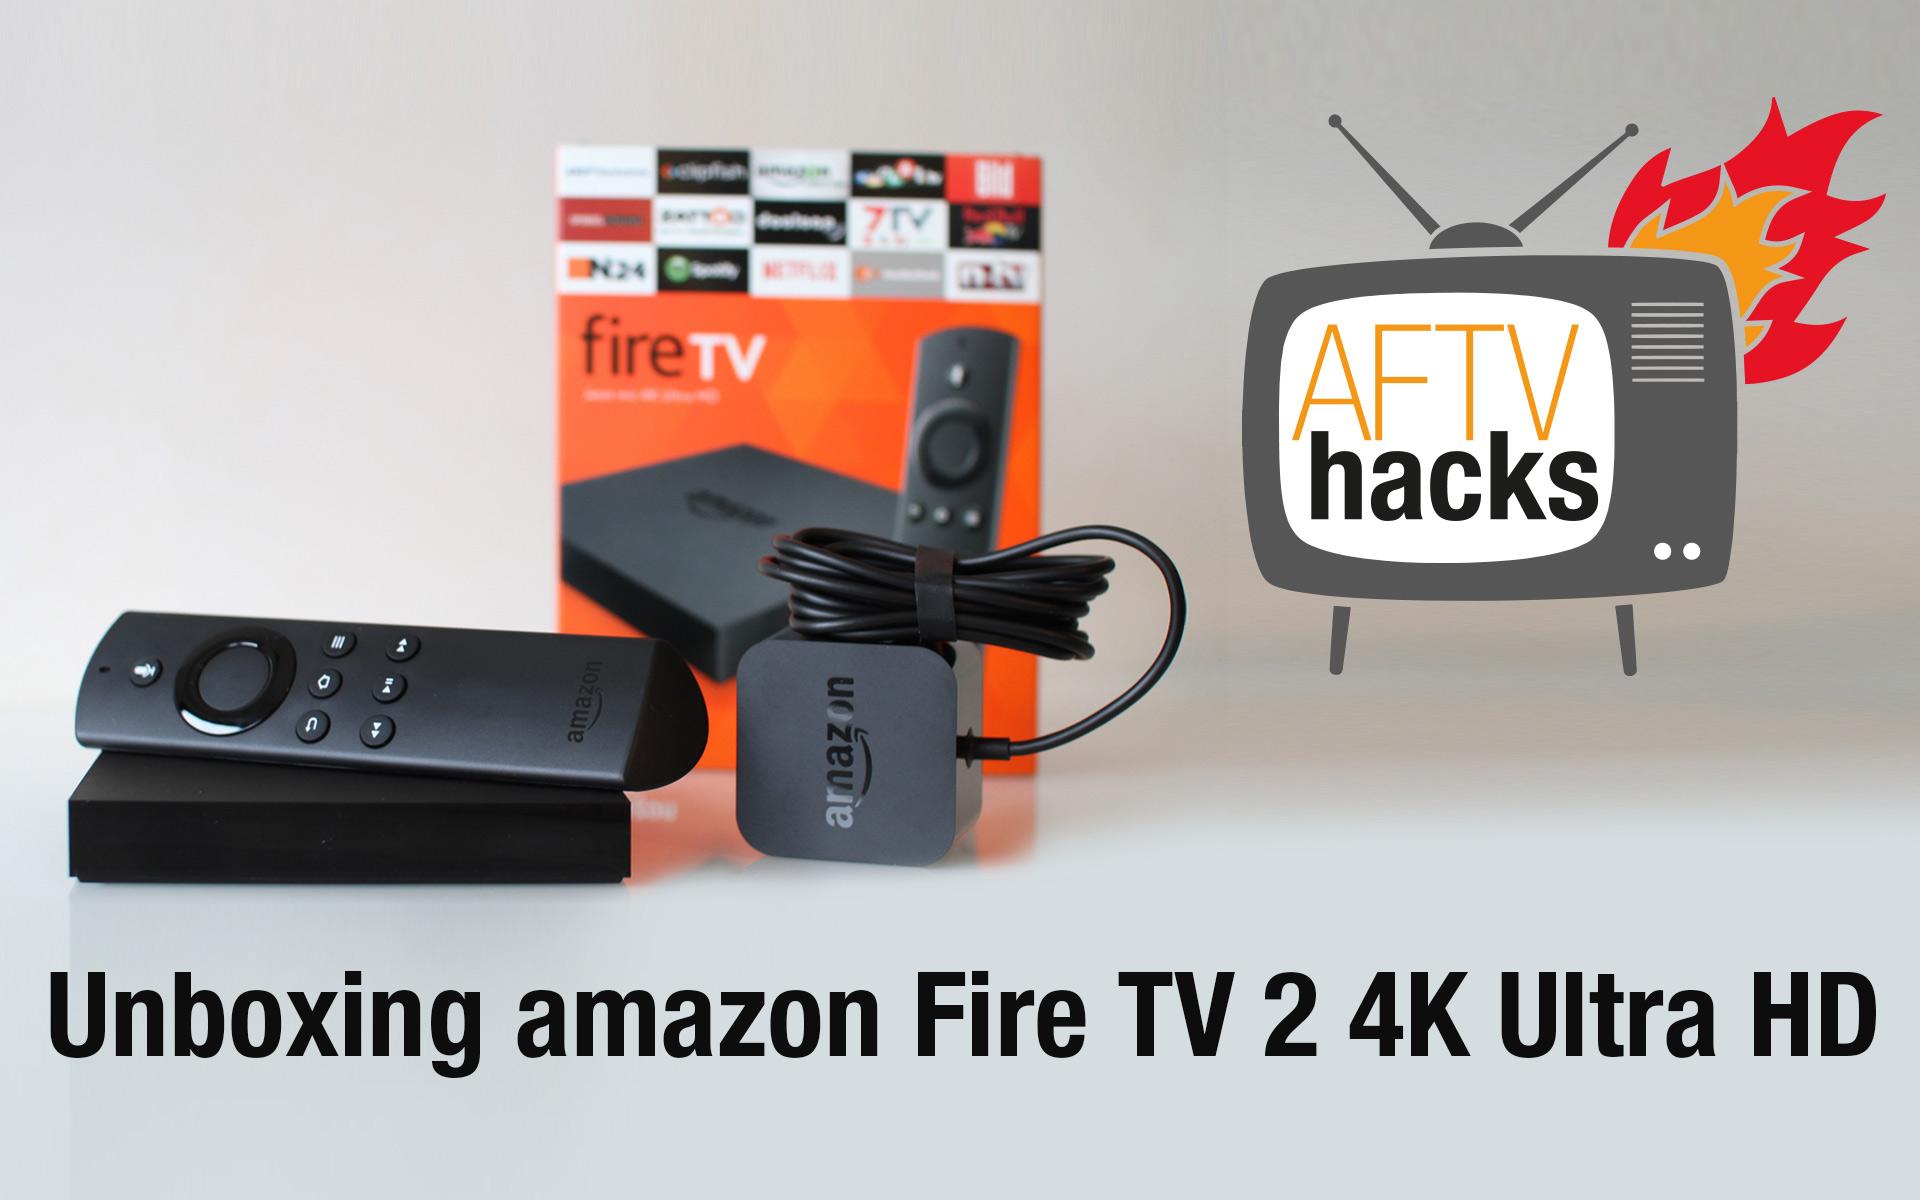 unboxing amazon fire tv 2 aftvhacks. Black Bedroom Furniture Sets. Home Design Ideas